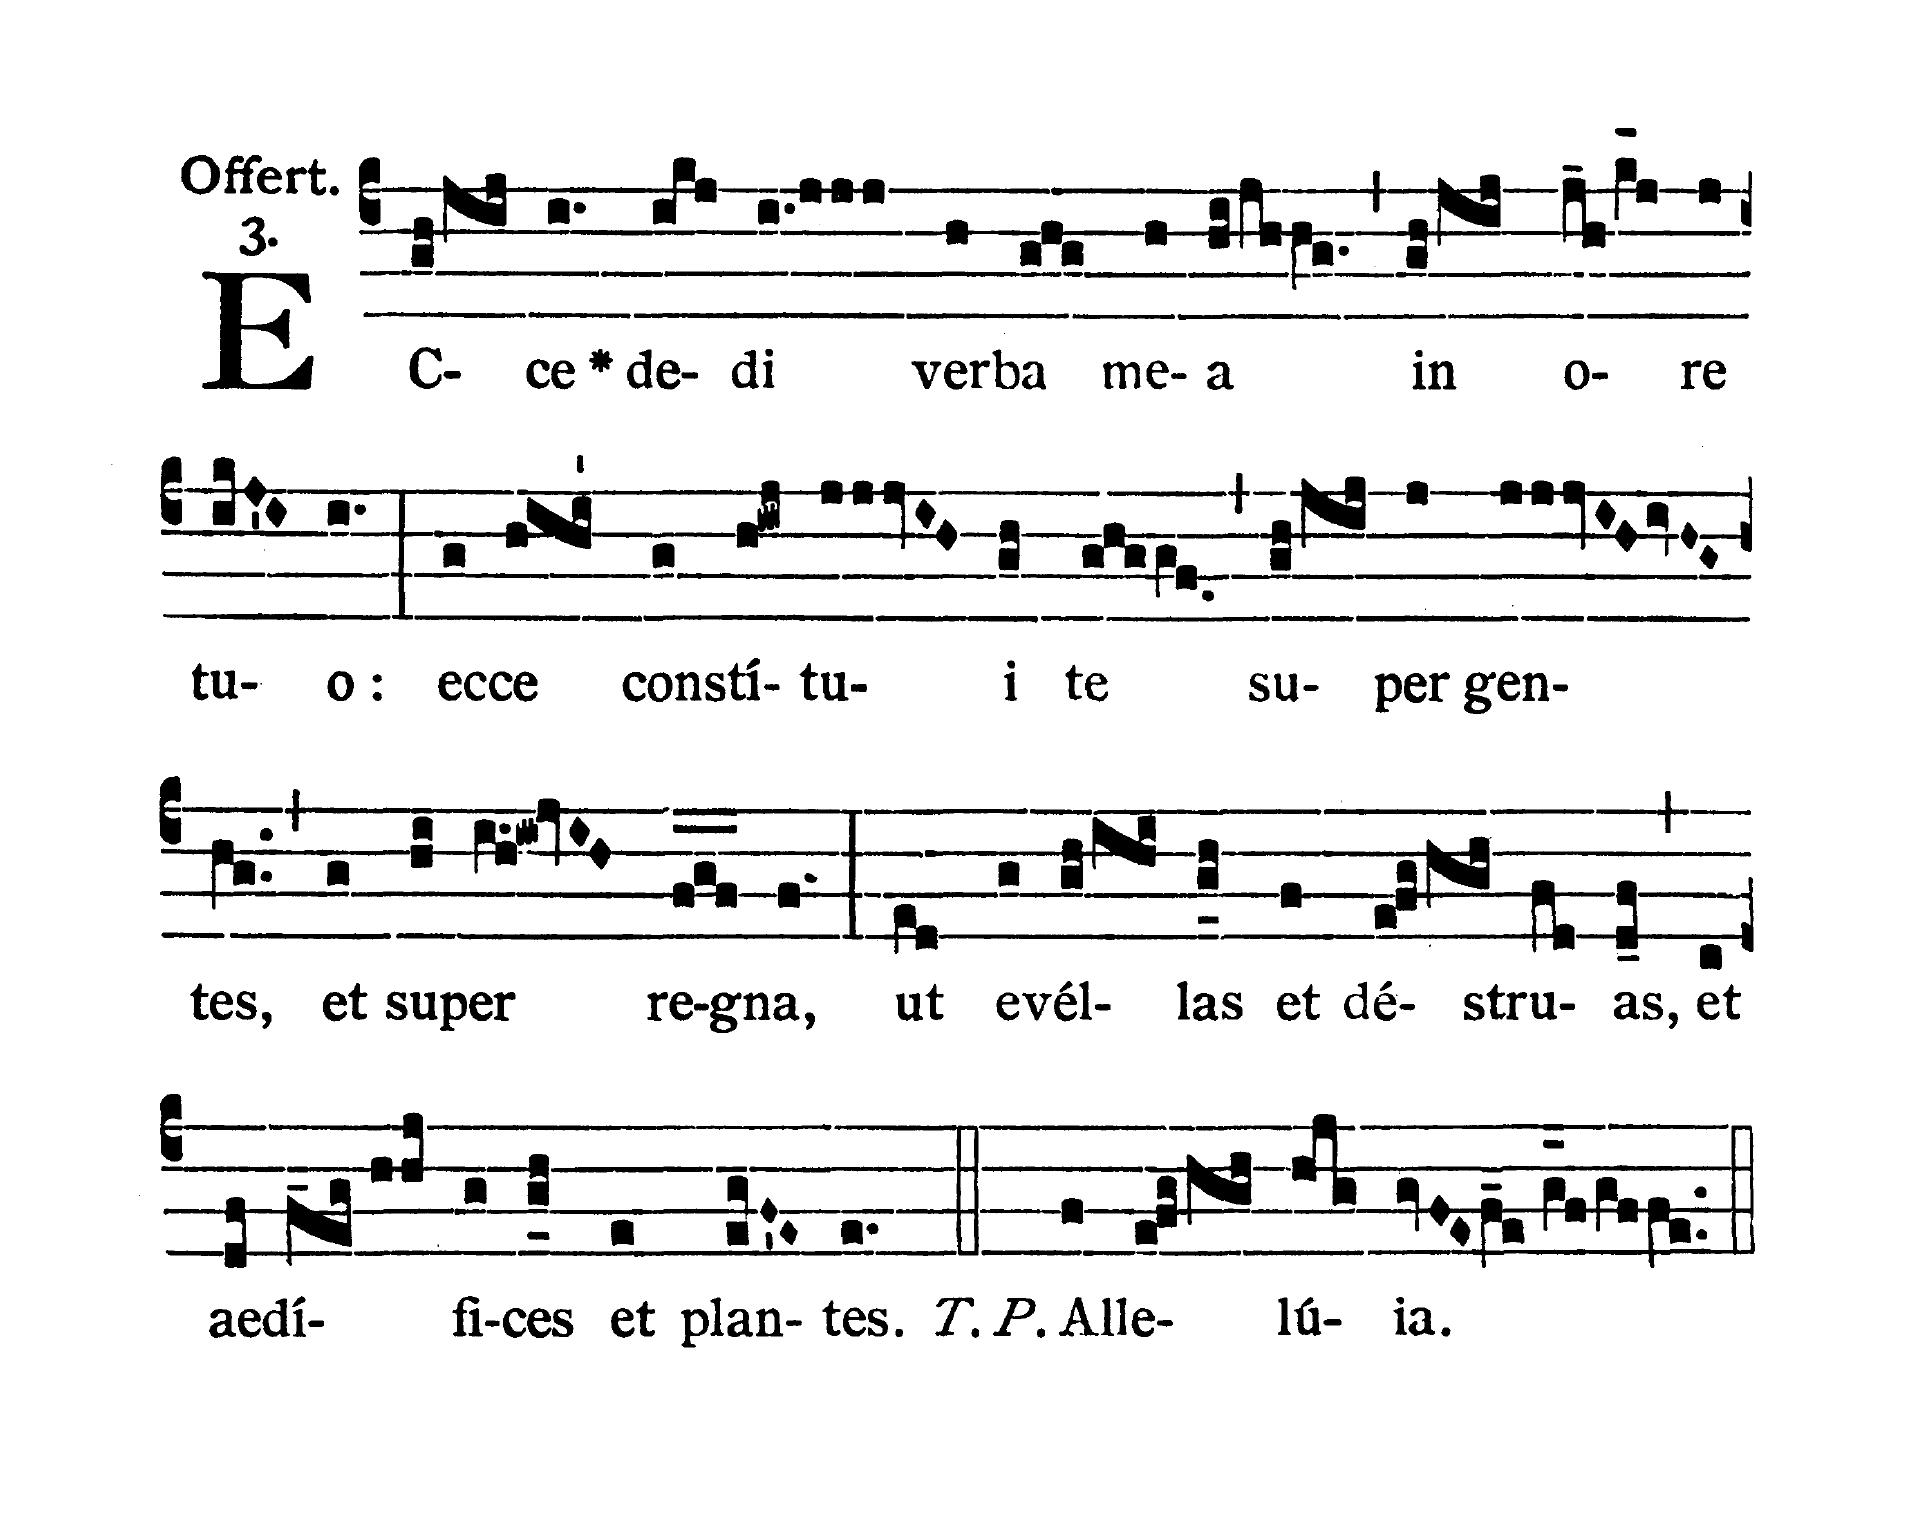 Sancti Telesphori Papae et Martyris (Świętego Telesfora Papieża i Męczennika) - Offertorium (Ecce dedi)